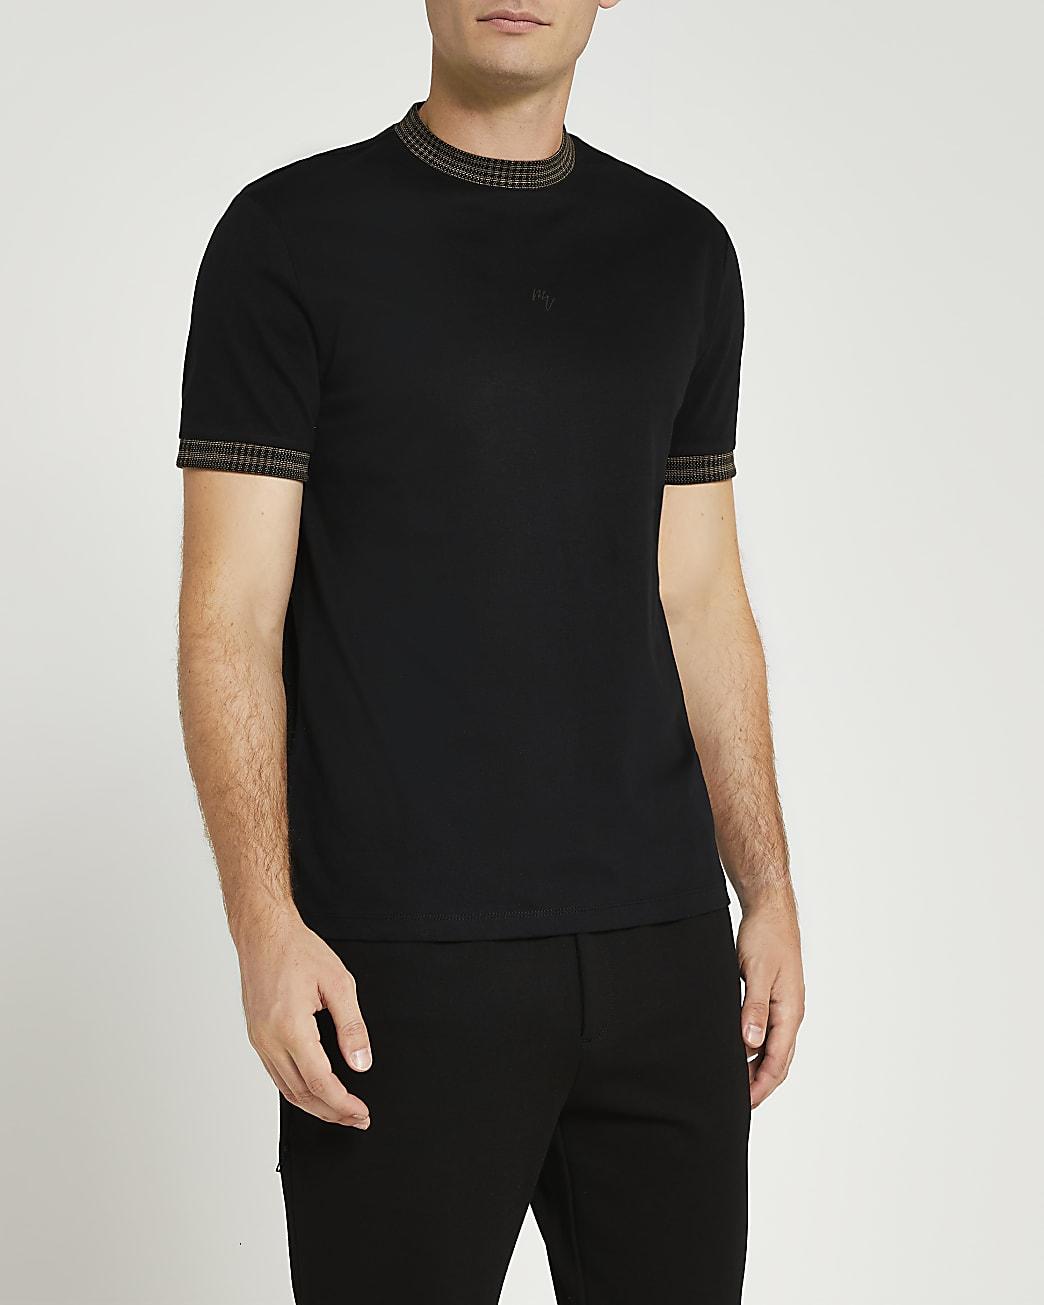 Maison Riviera black slim fit check t-shirt